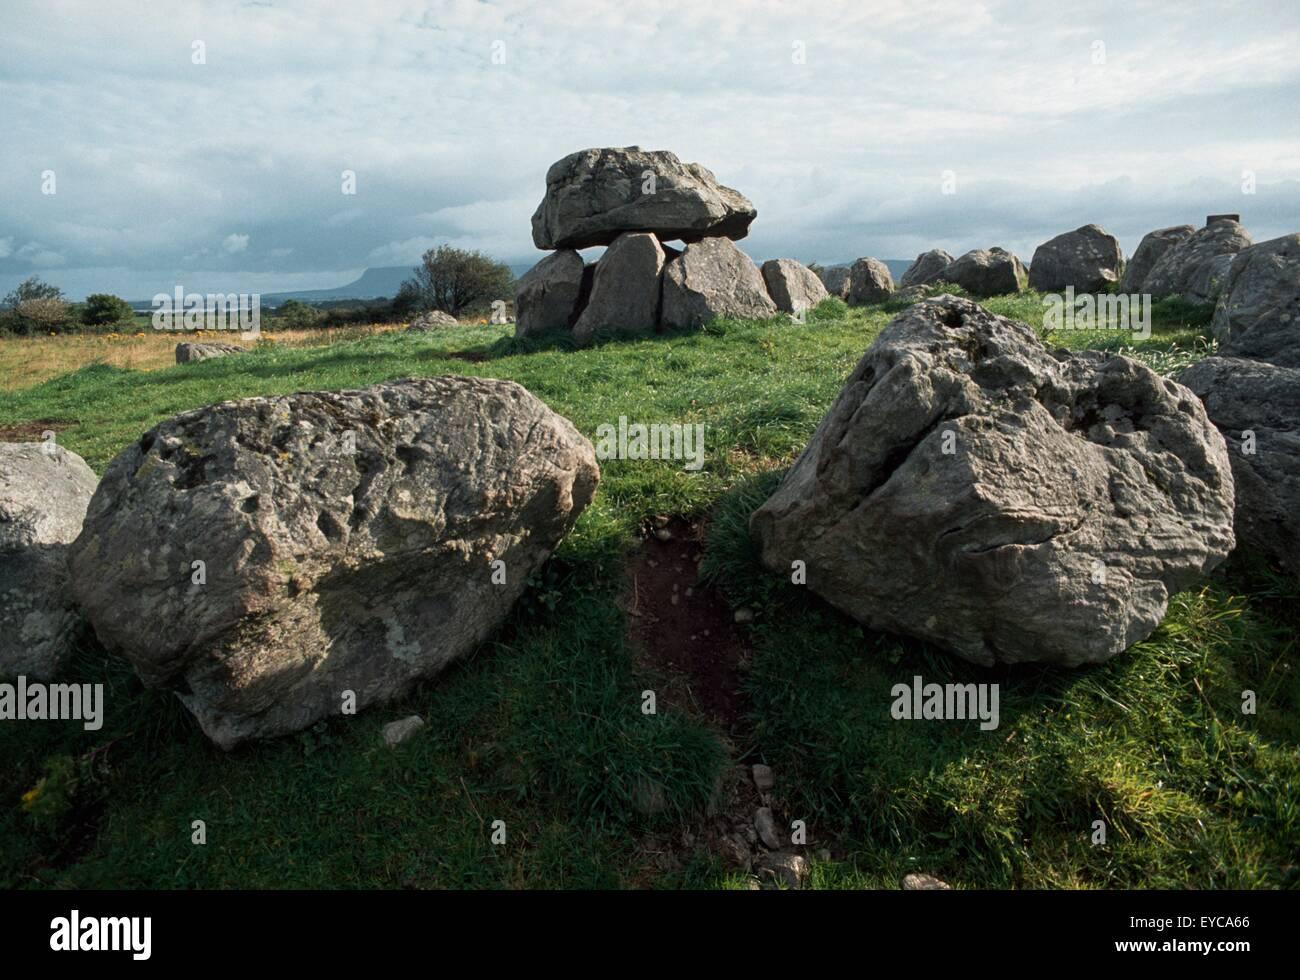 Carrowmore, Co Sligo, Ireland; Dolmen Within A Stone Circle At A Prehistoric Ritual Landscape - Stock Image